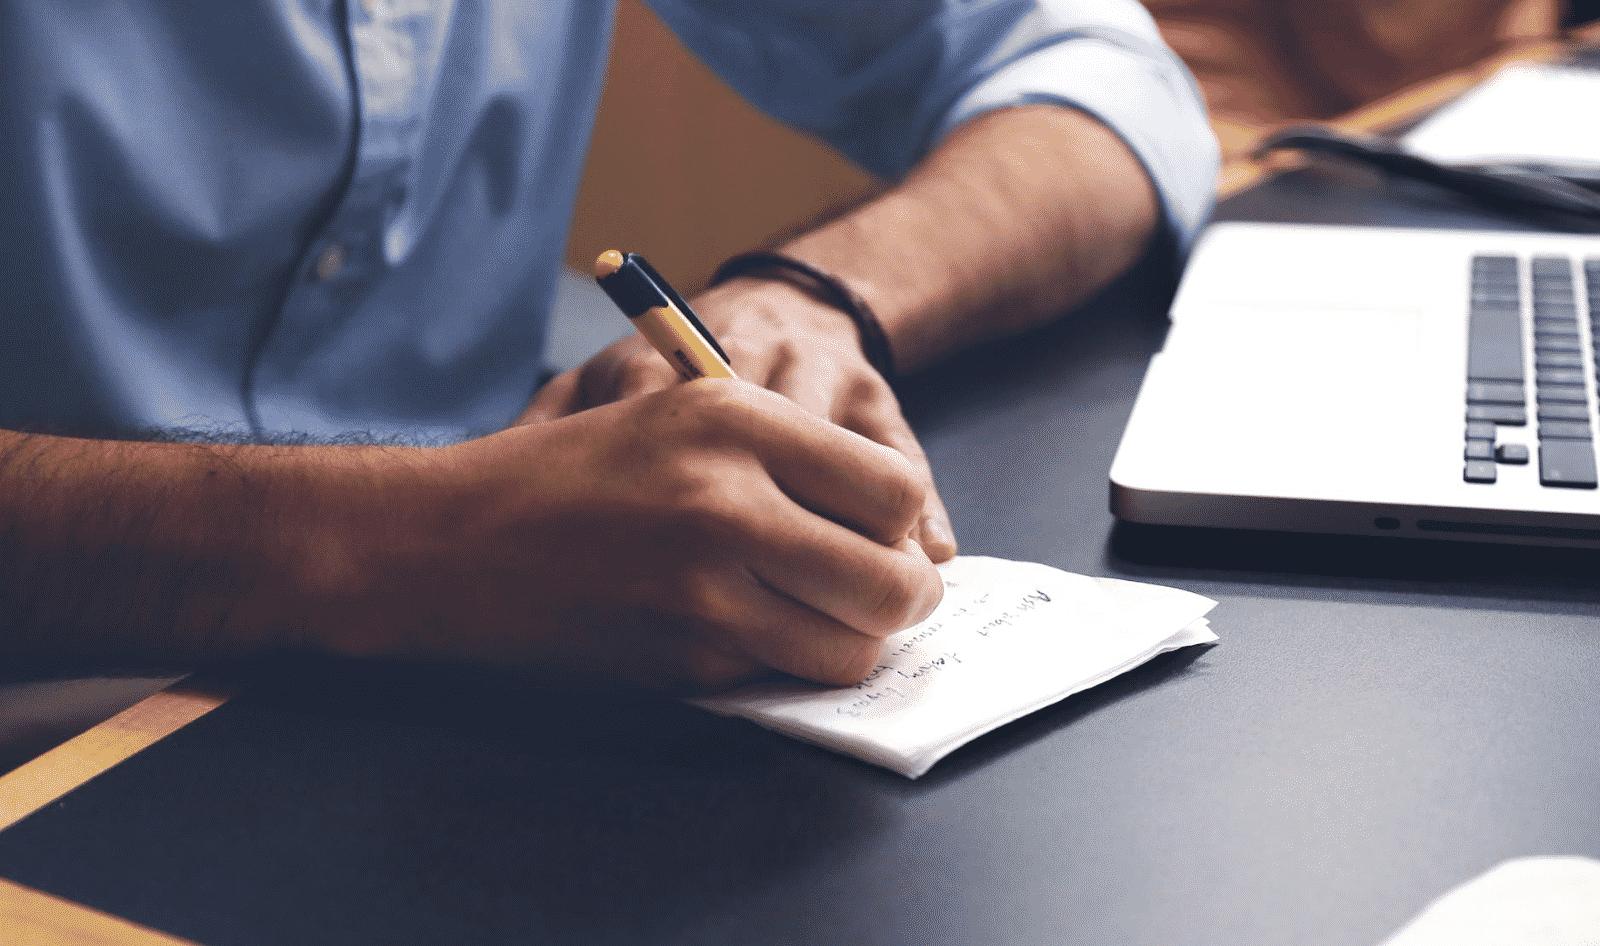 Man Writing Exam Day